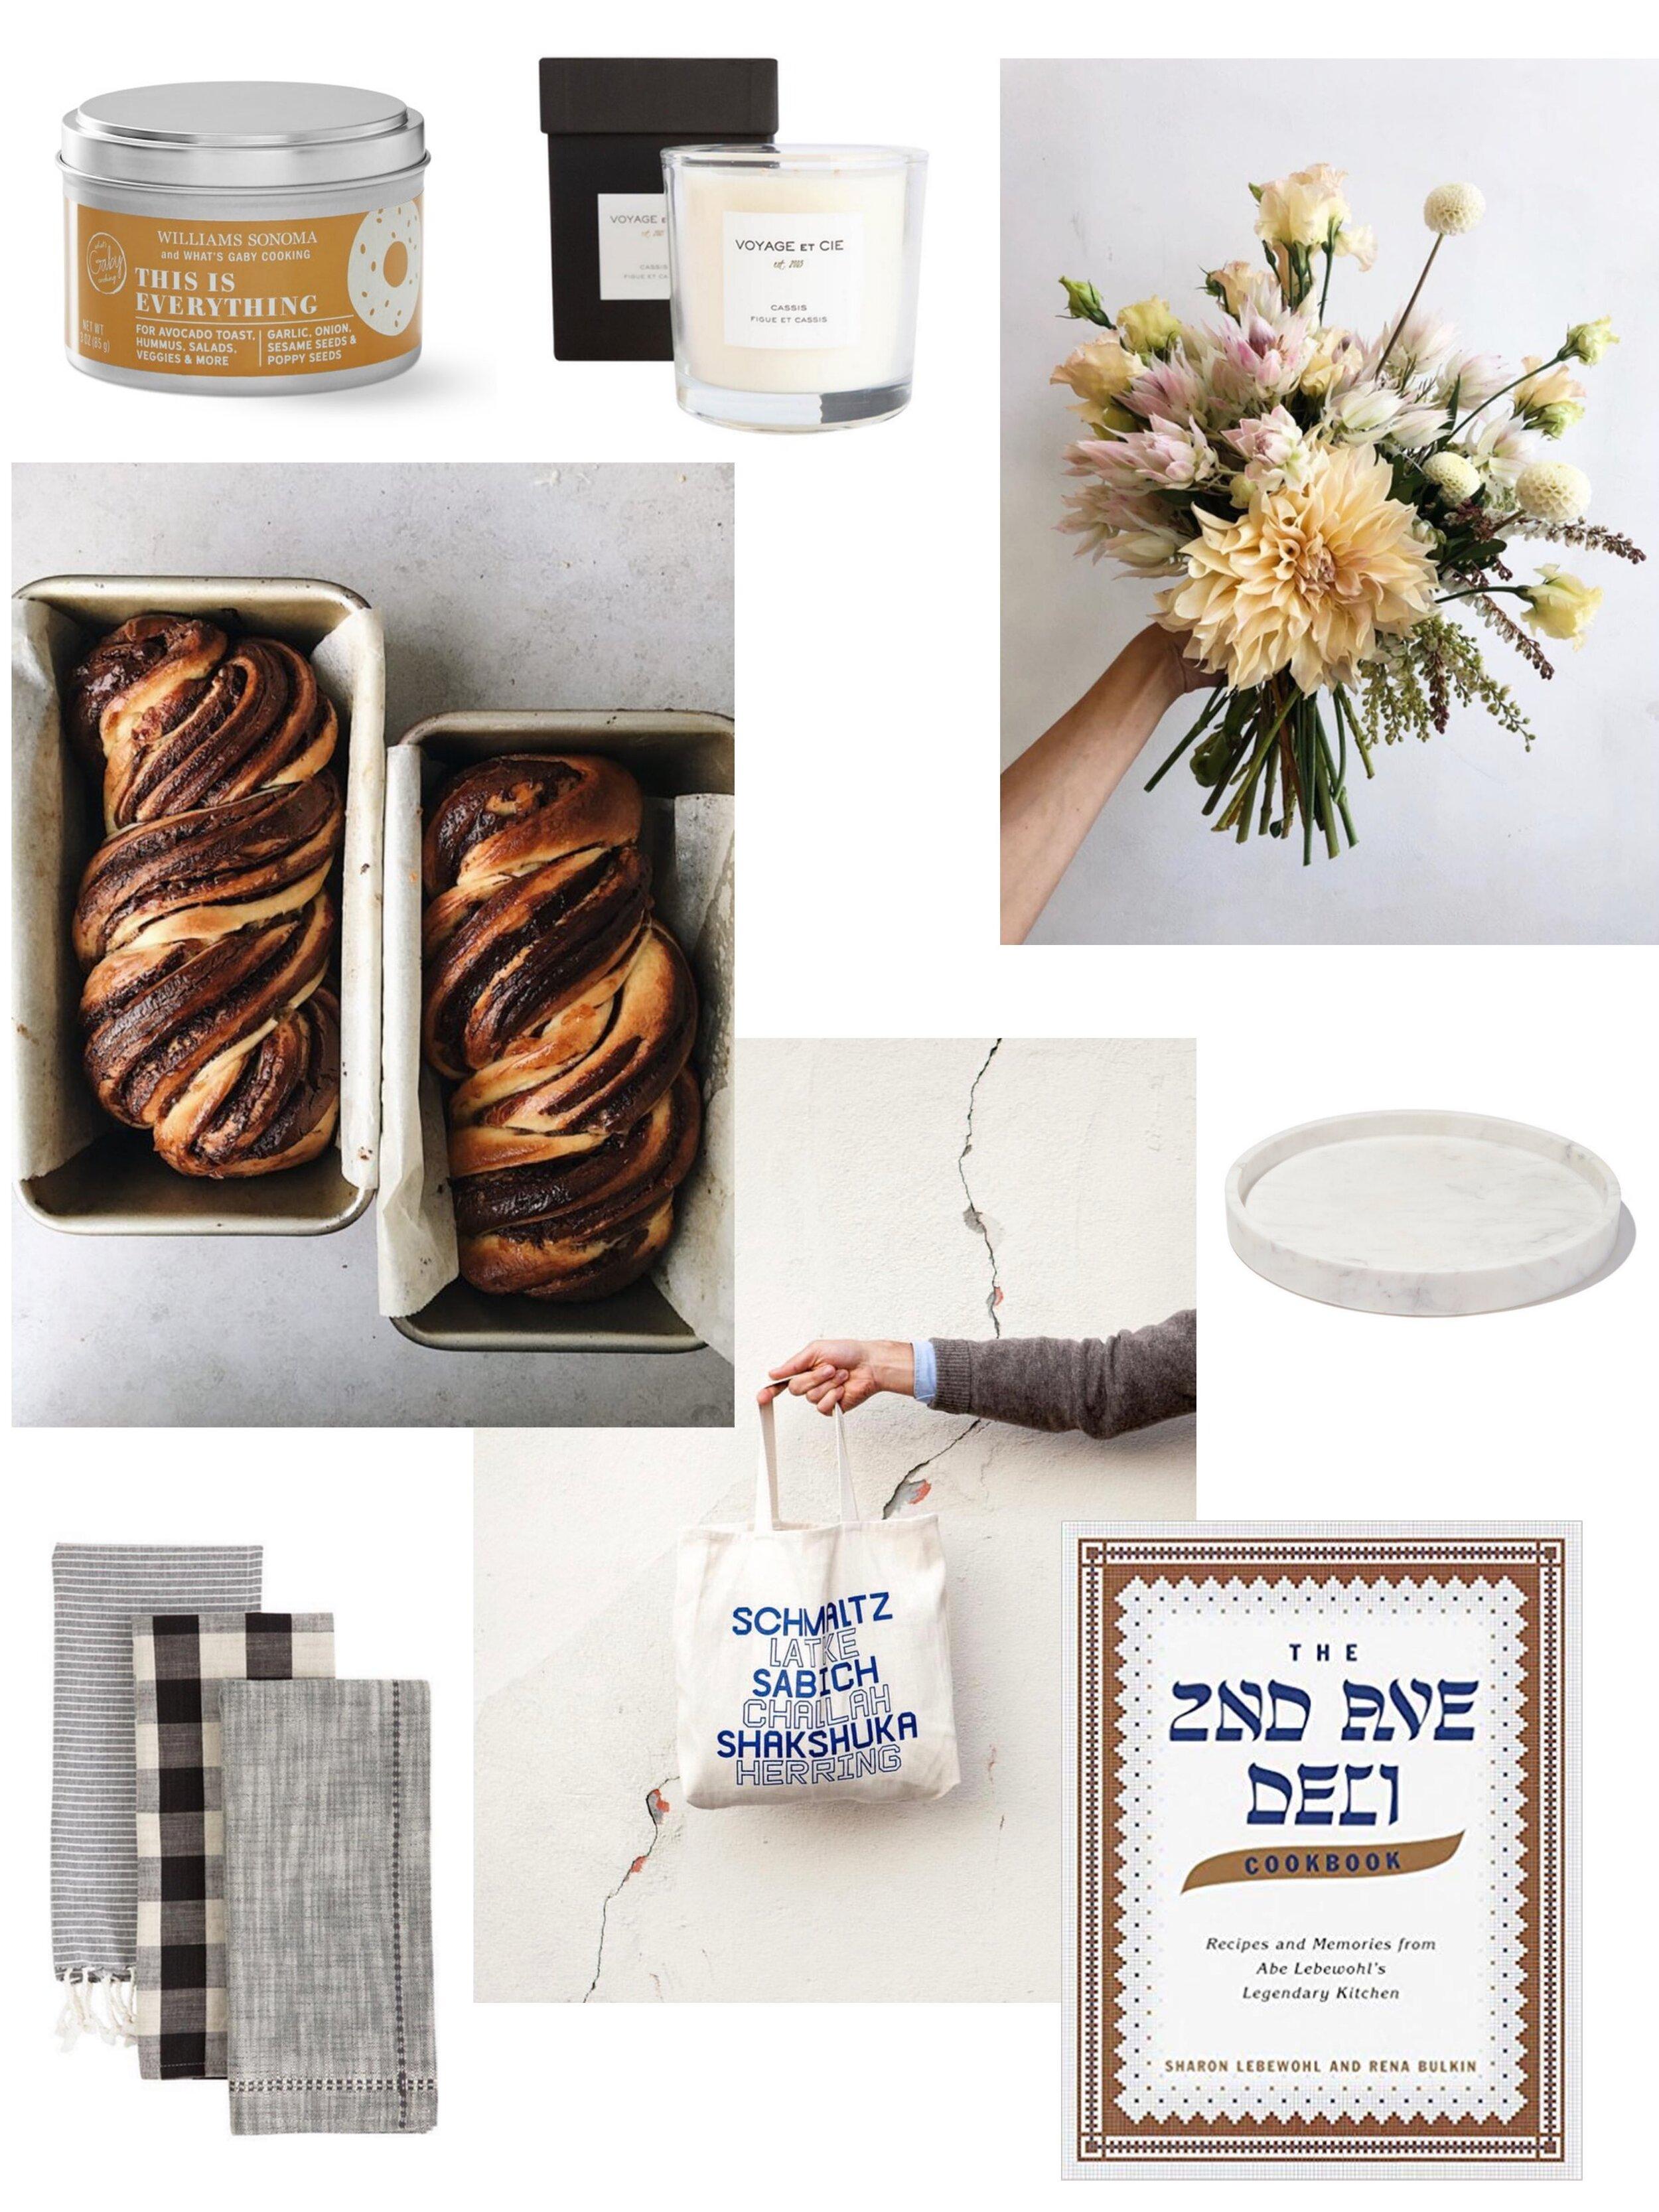 yom-kippur-hostess-gifts-what-to-bring-to-yom-kippur-break-fast.jpg